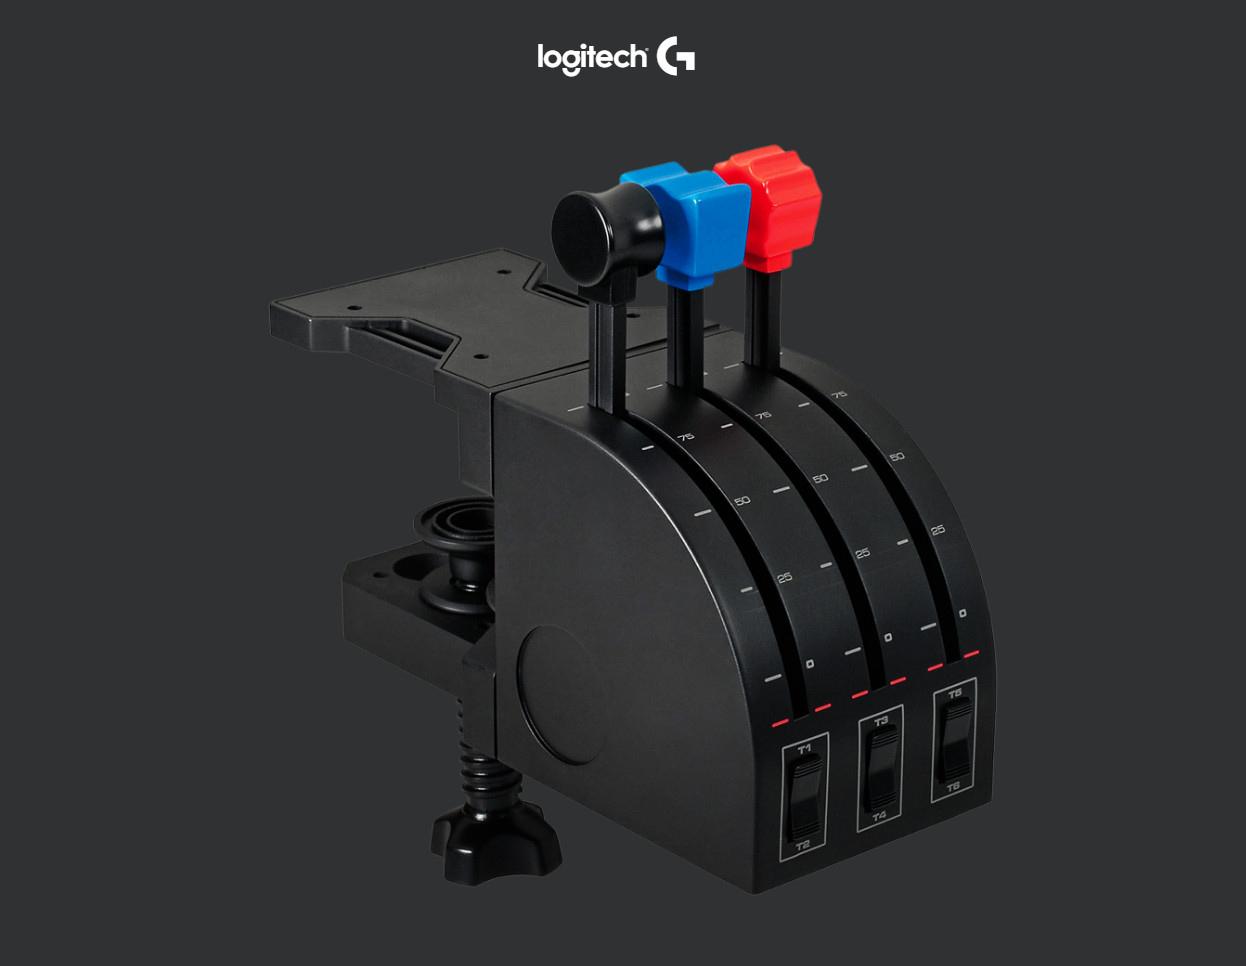 Logitech G Saitek PRO Flight Throttle Quadrant - Newegg com